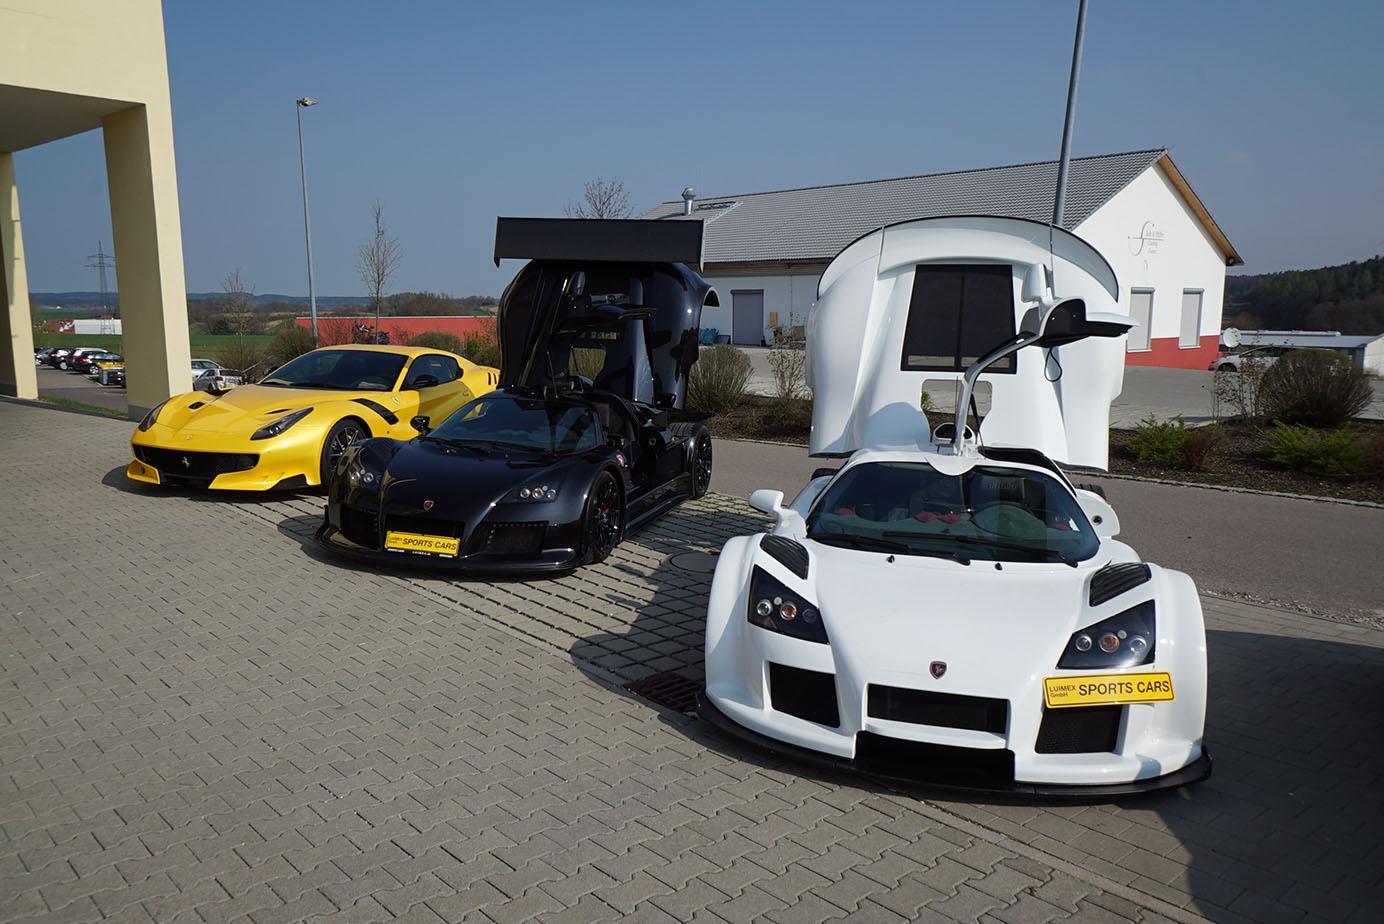 Ferrari F12 tdf und Gumpert Apollo